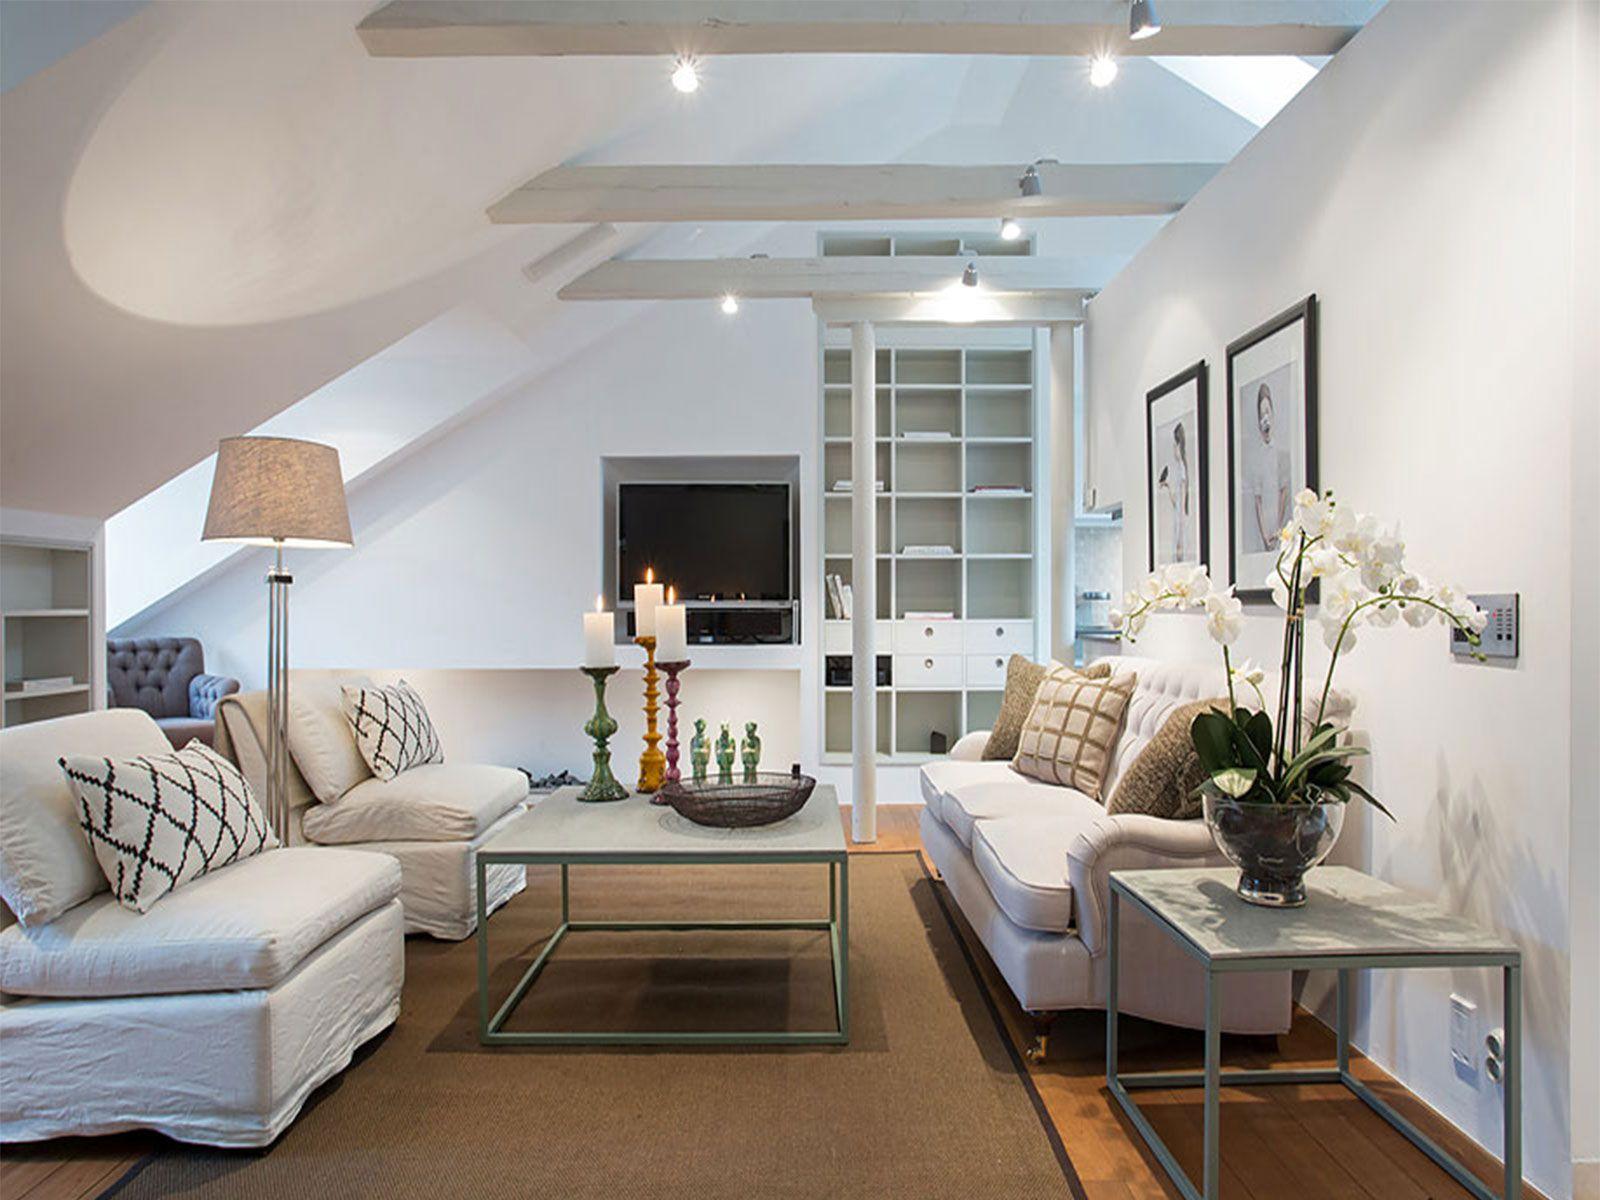 Decorating Attic Rooms interior: modern attic kitchen living room combo decorating ideas